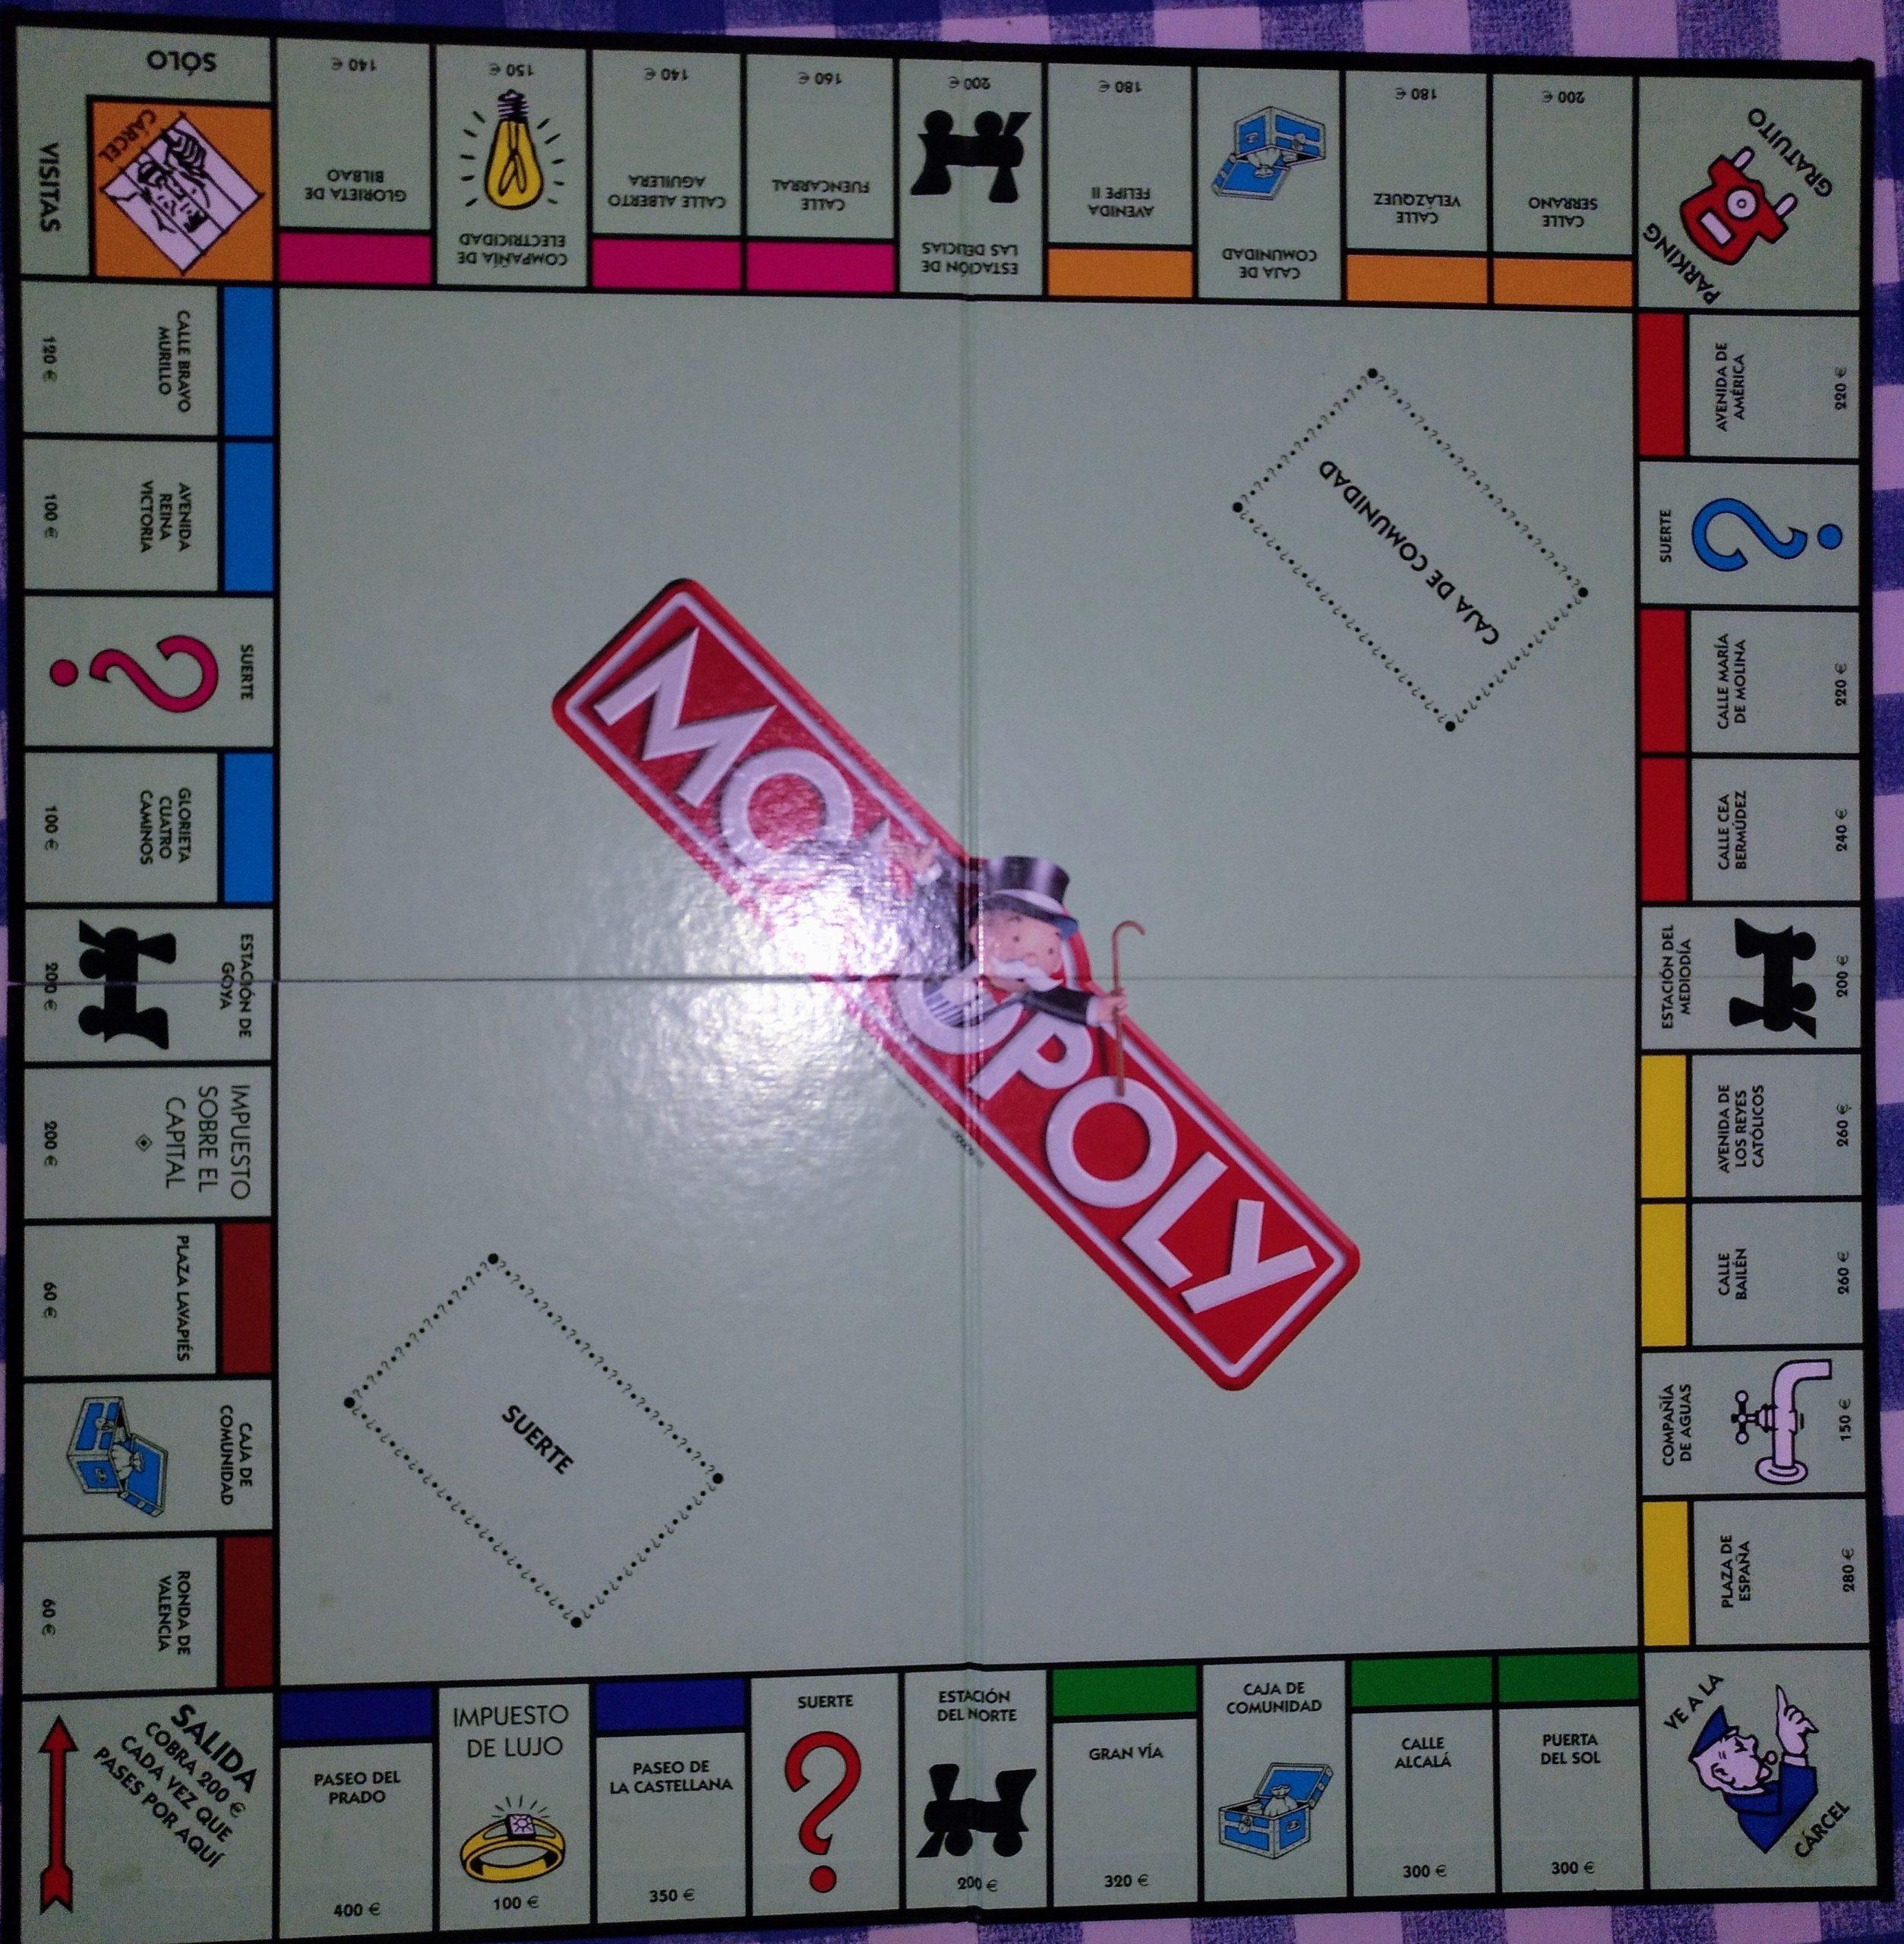 Tablero Monopoly Original